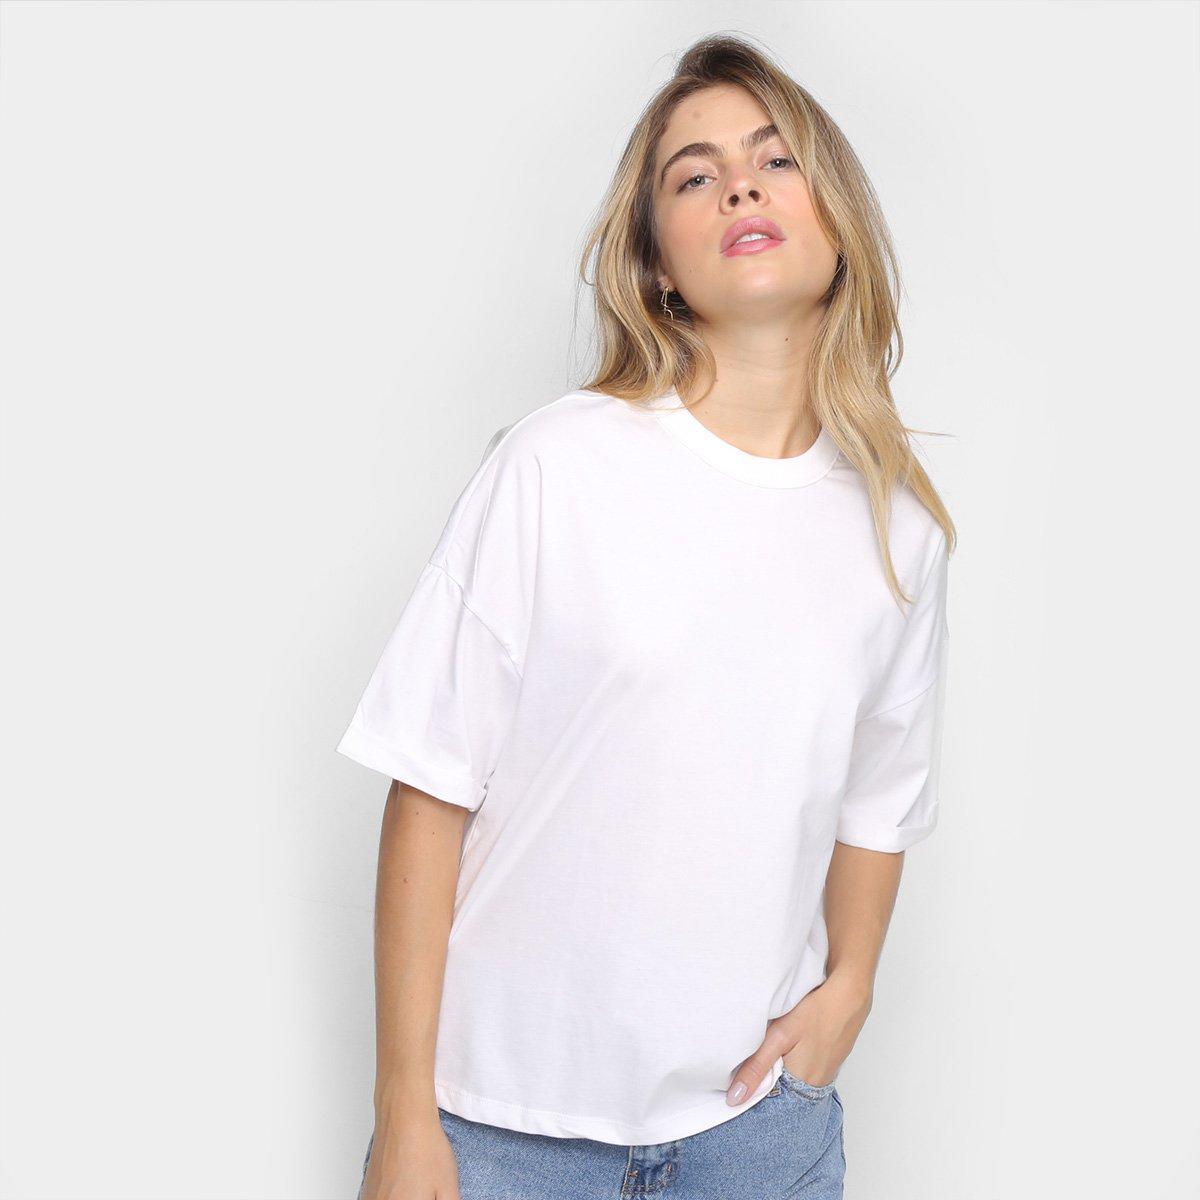 Camiseta Colcci Terra Ampla Feminina